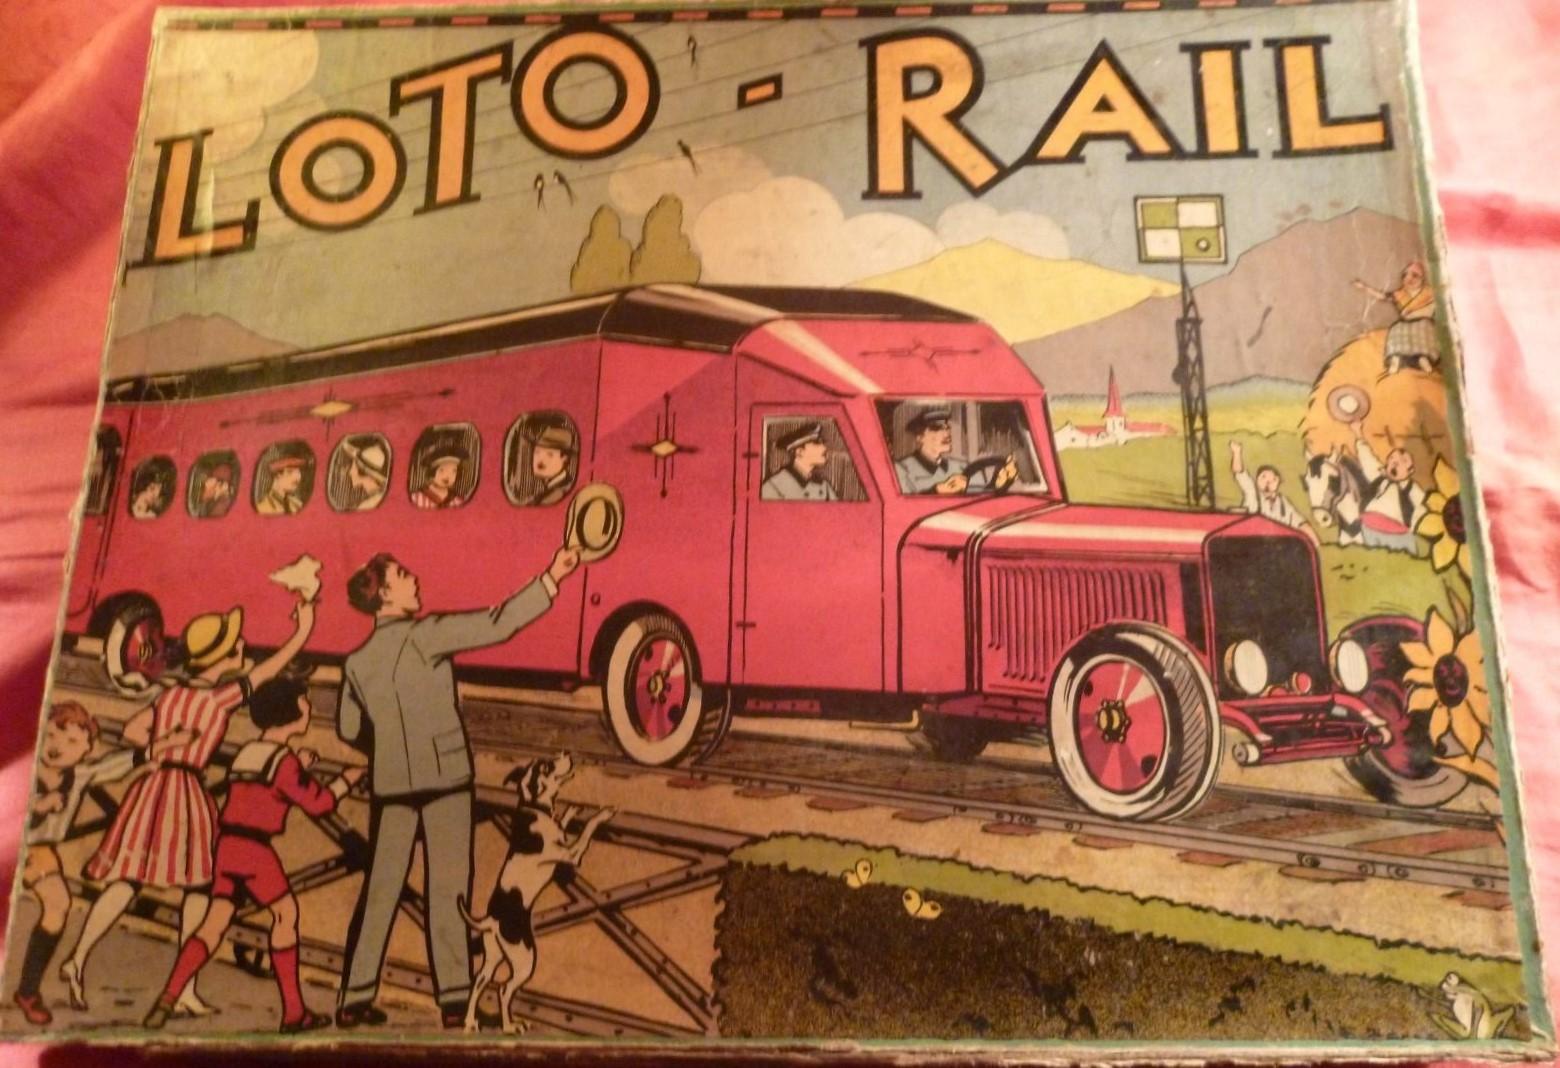 loto rail.jpg